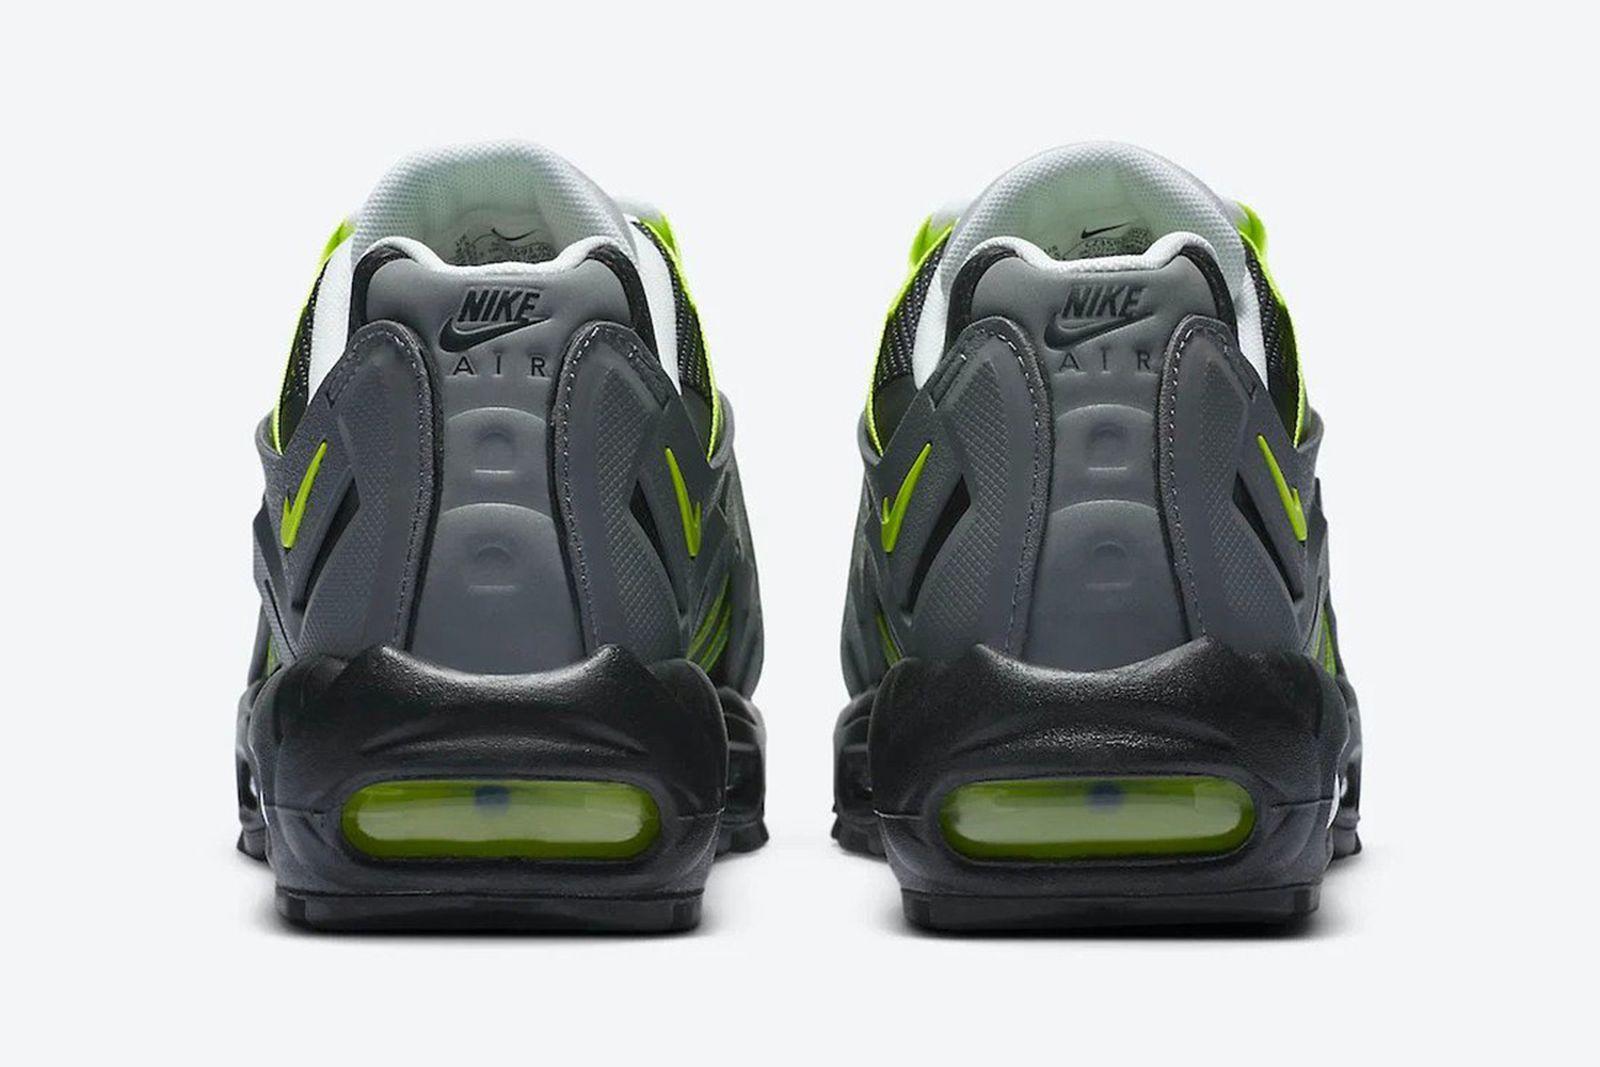 nike-air-max-95-ndstrkt-neon-release-date-price-06